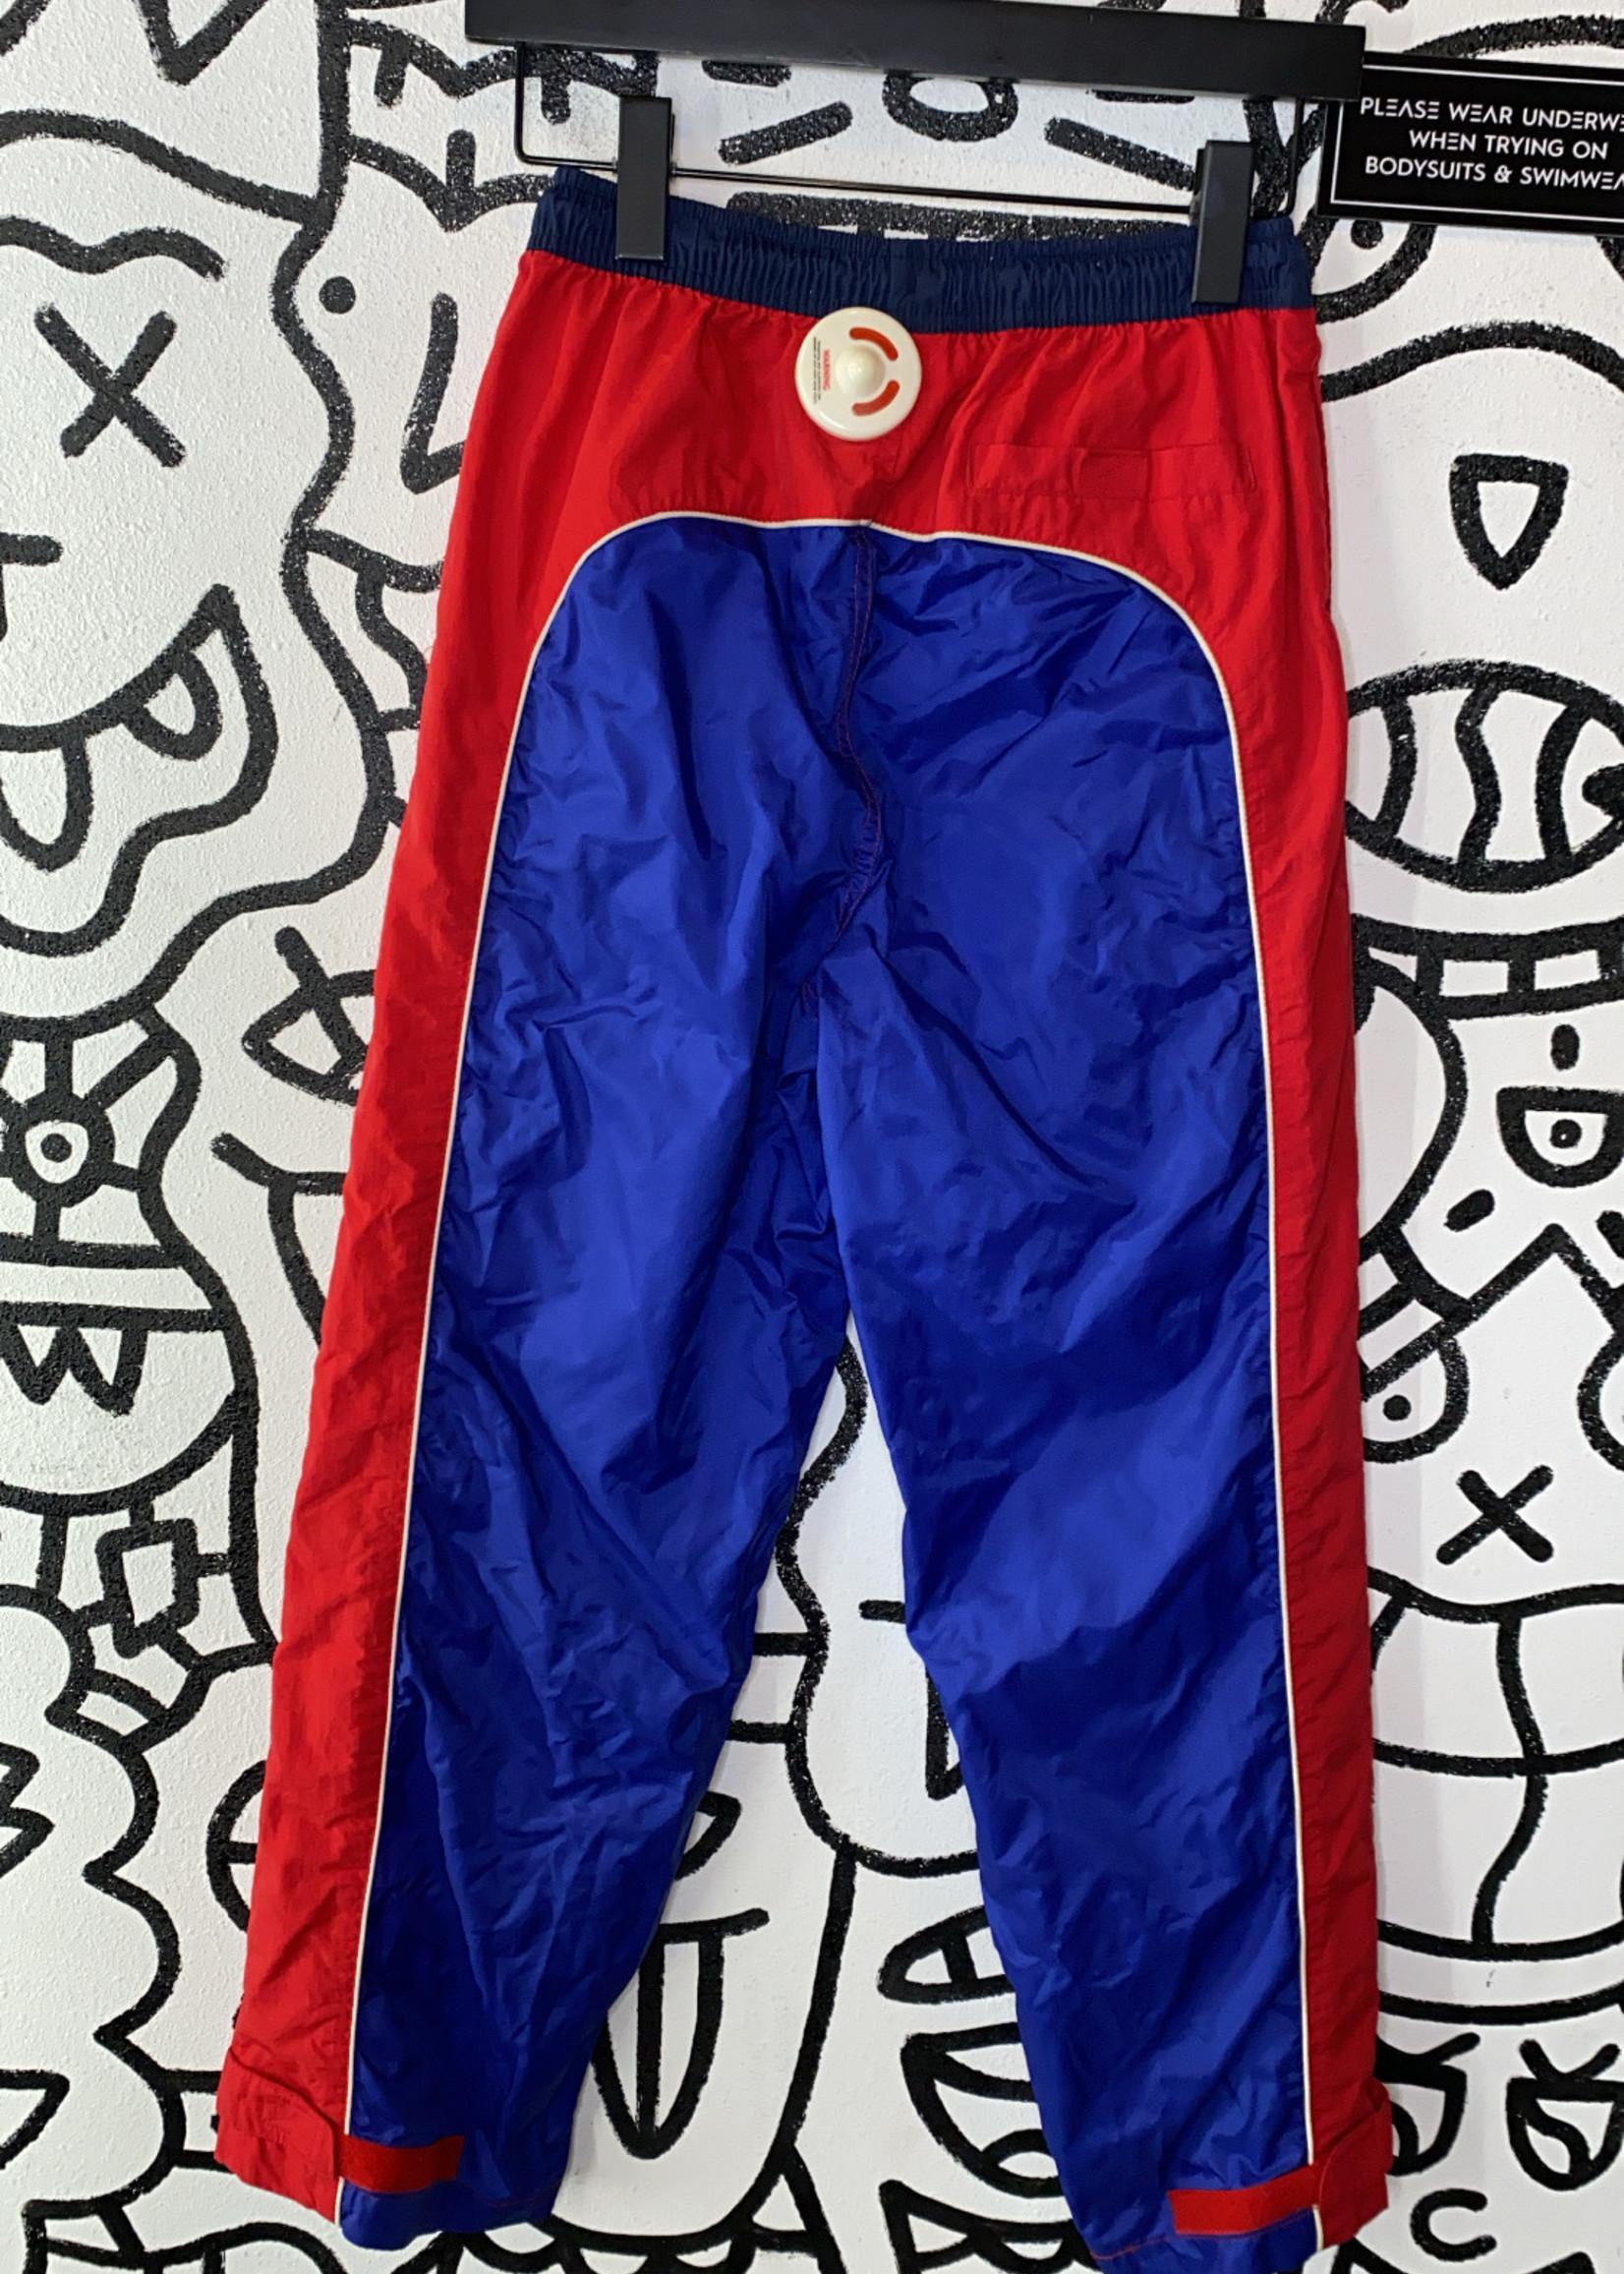 Vintage hilfiger windbreaker pants XS